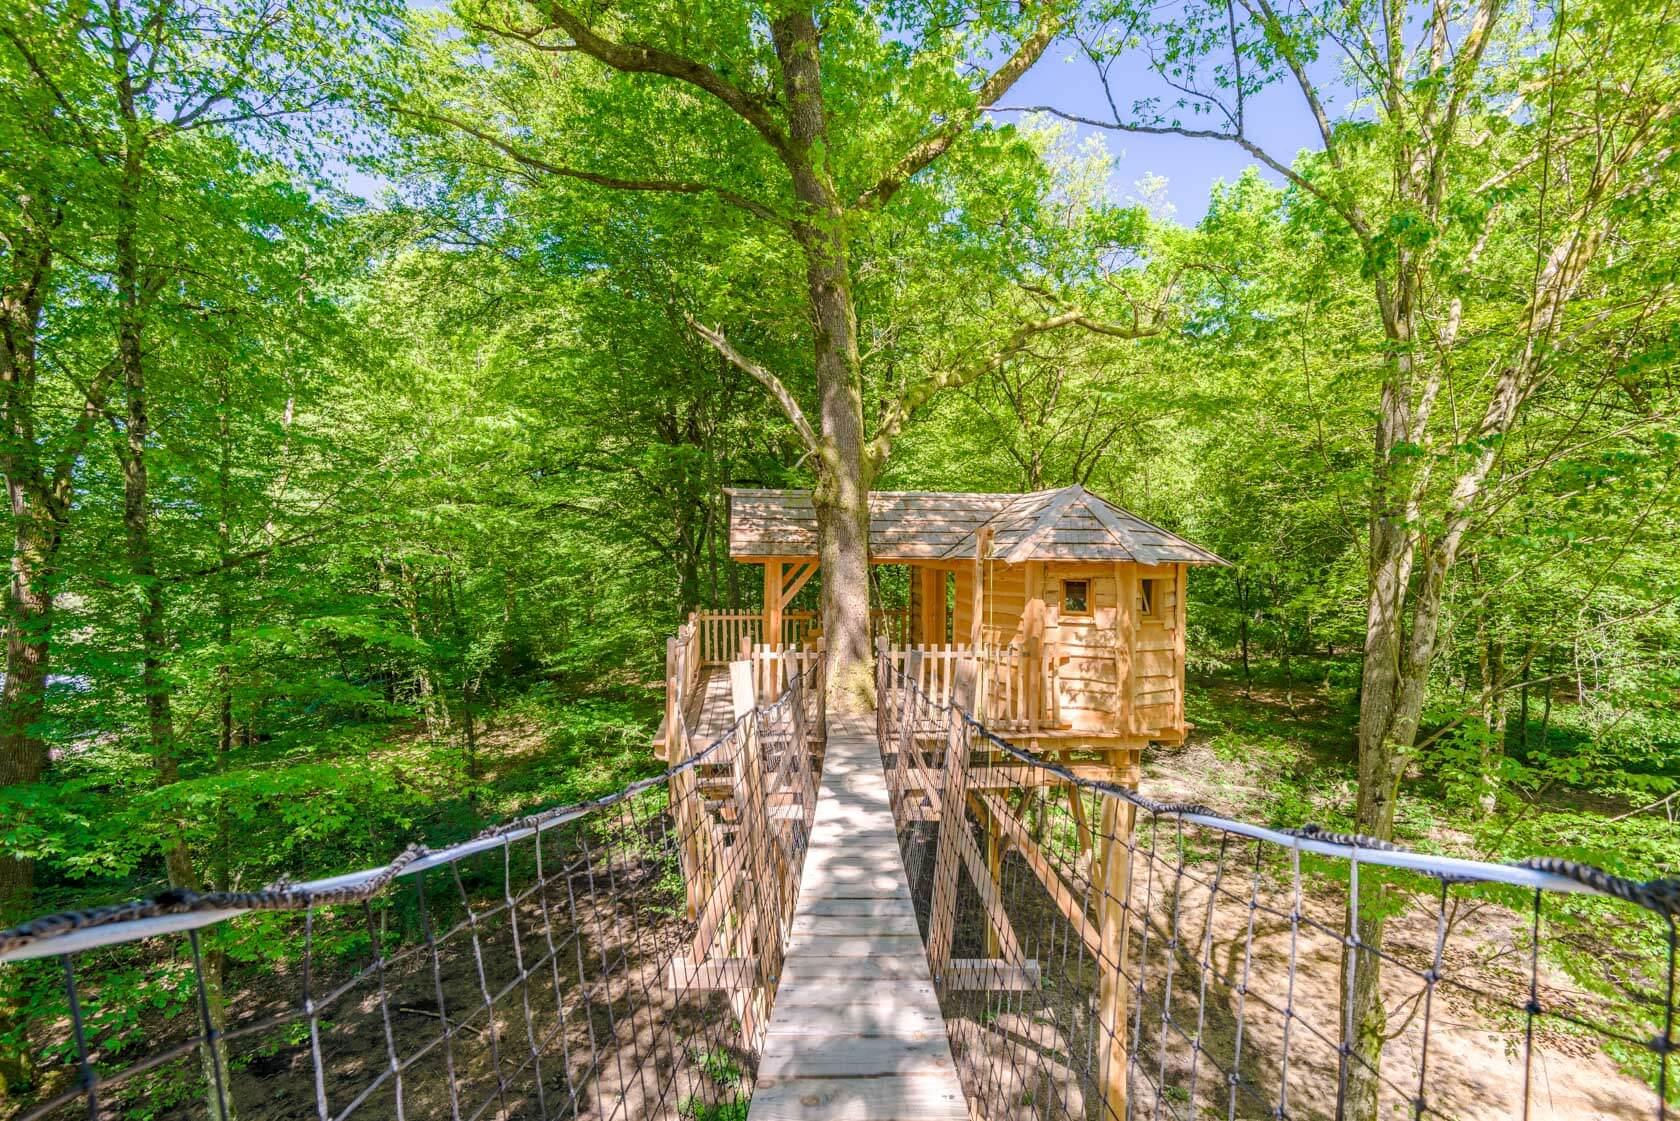 Hébergement insolite Lov'nid nature - Les Cro'coeurs Blog voyage